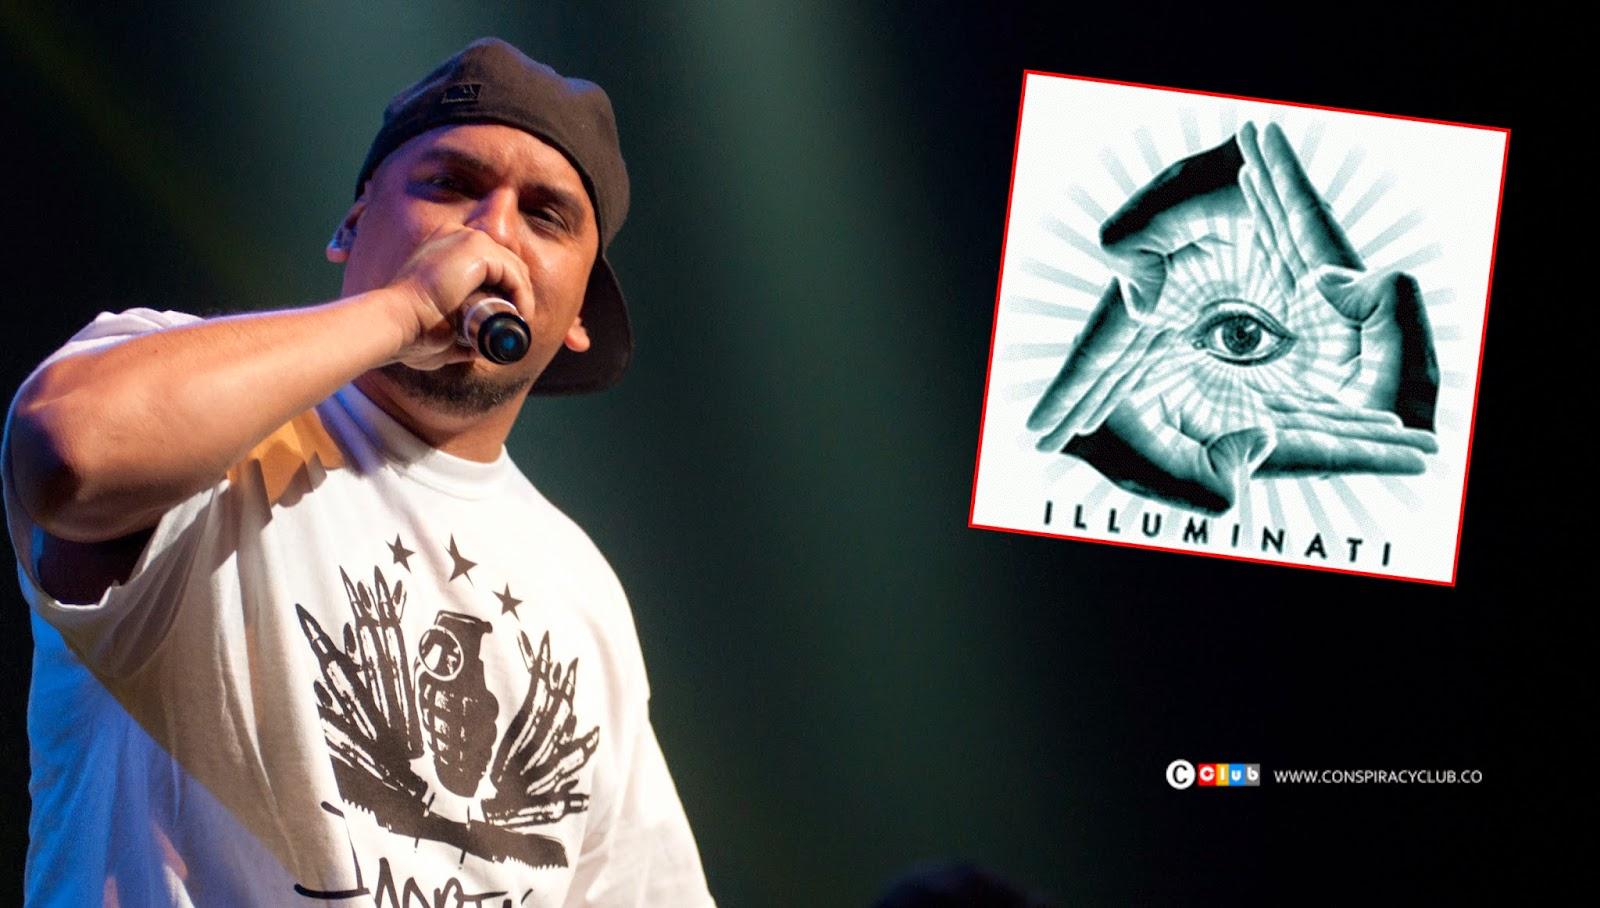 Immortal Technique Rapper Discusses The Illuminati